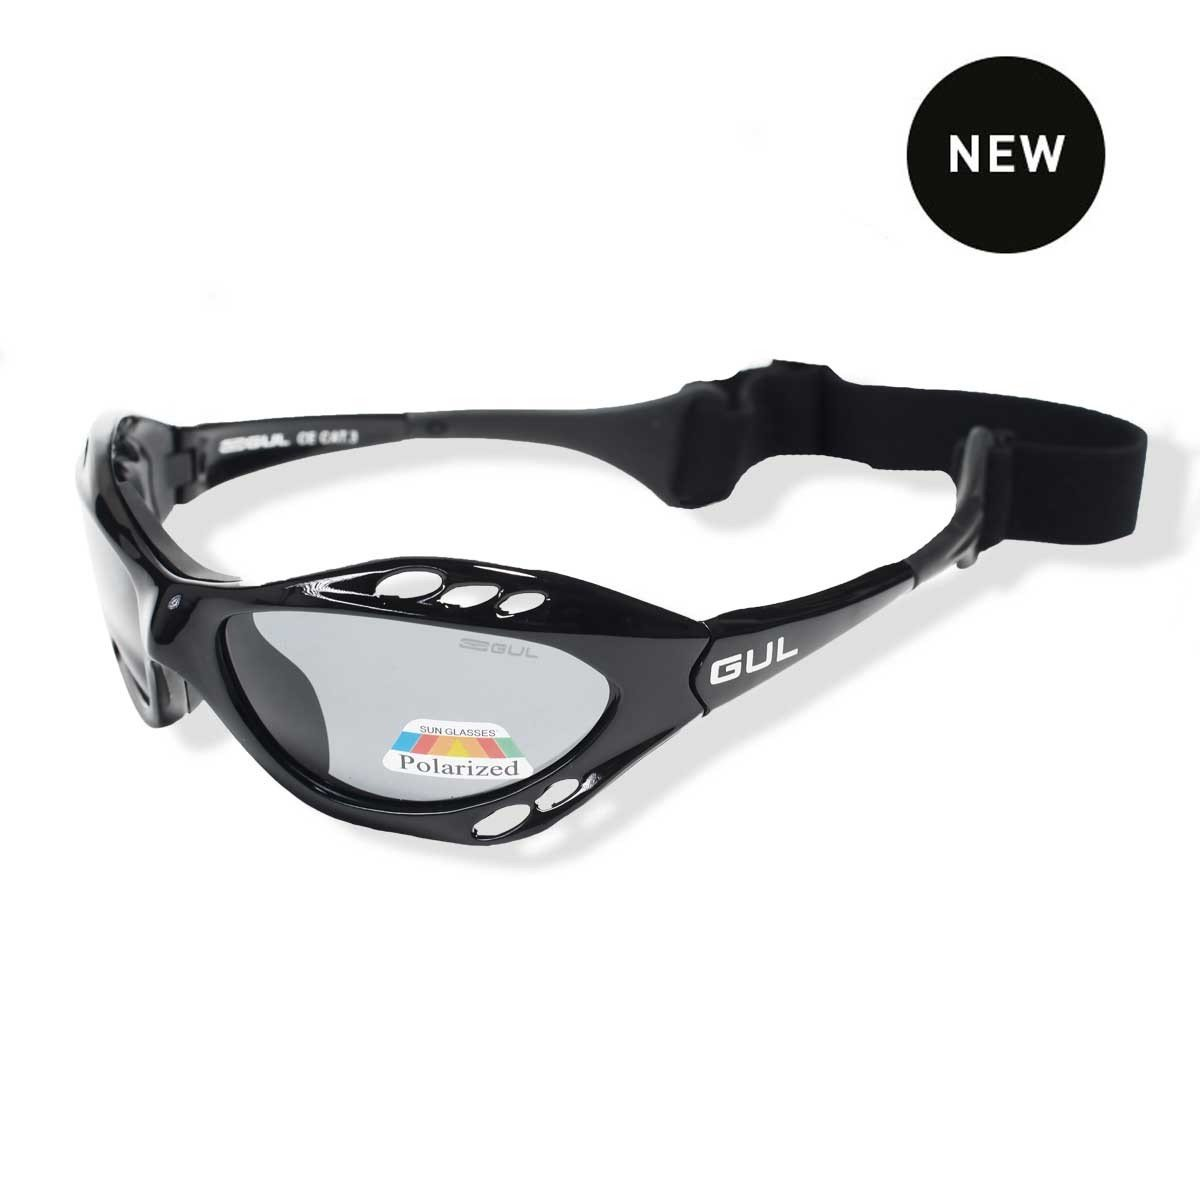 Gul Cz Evo Floating Sunglasses   Sg0007-B2